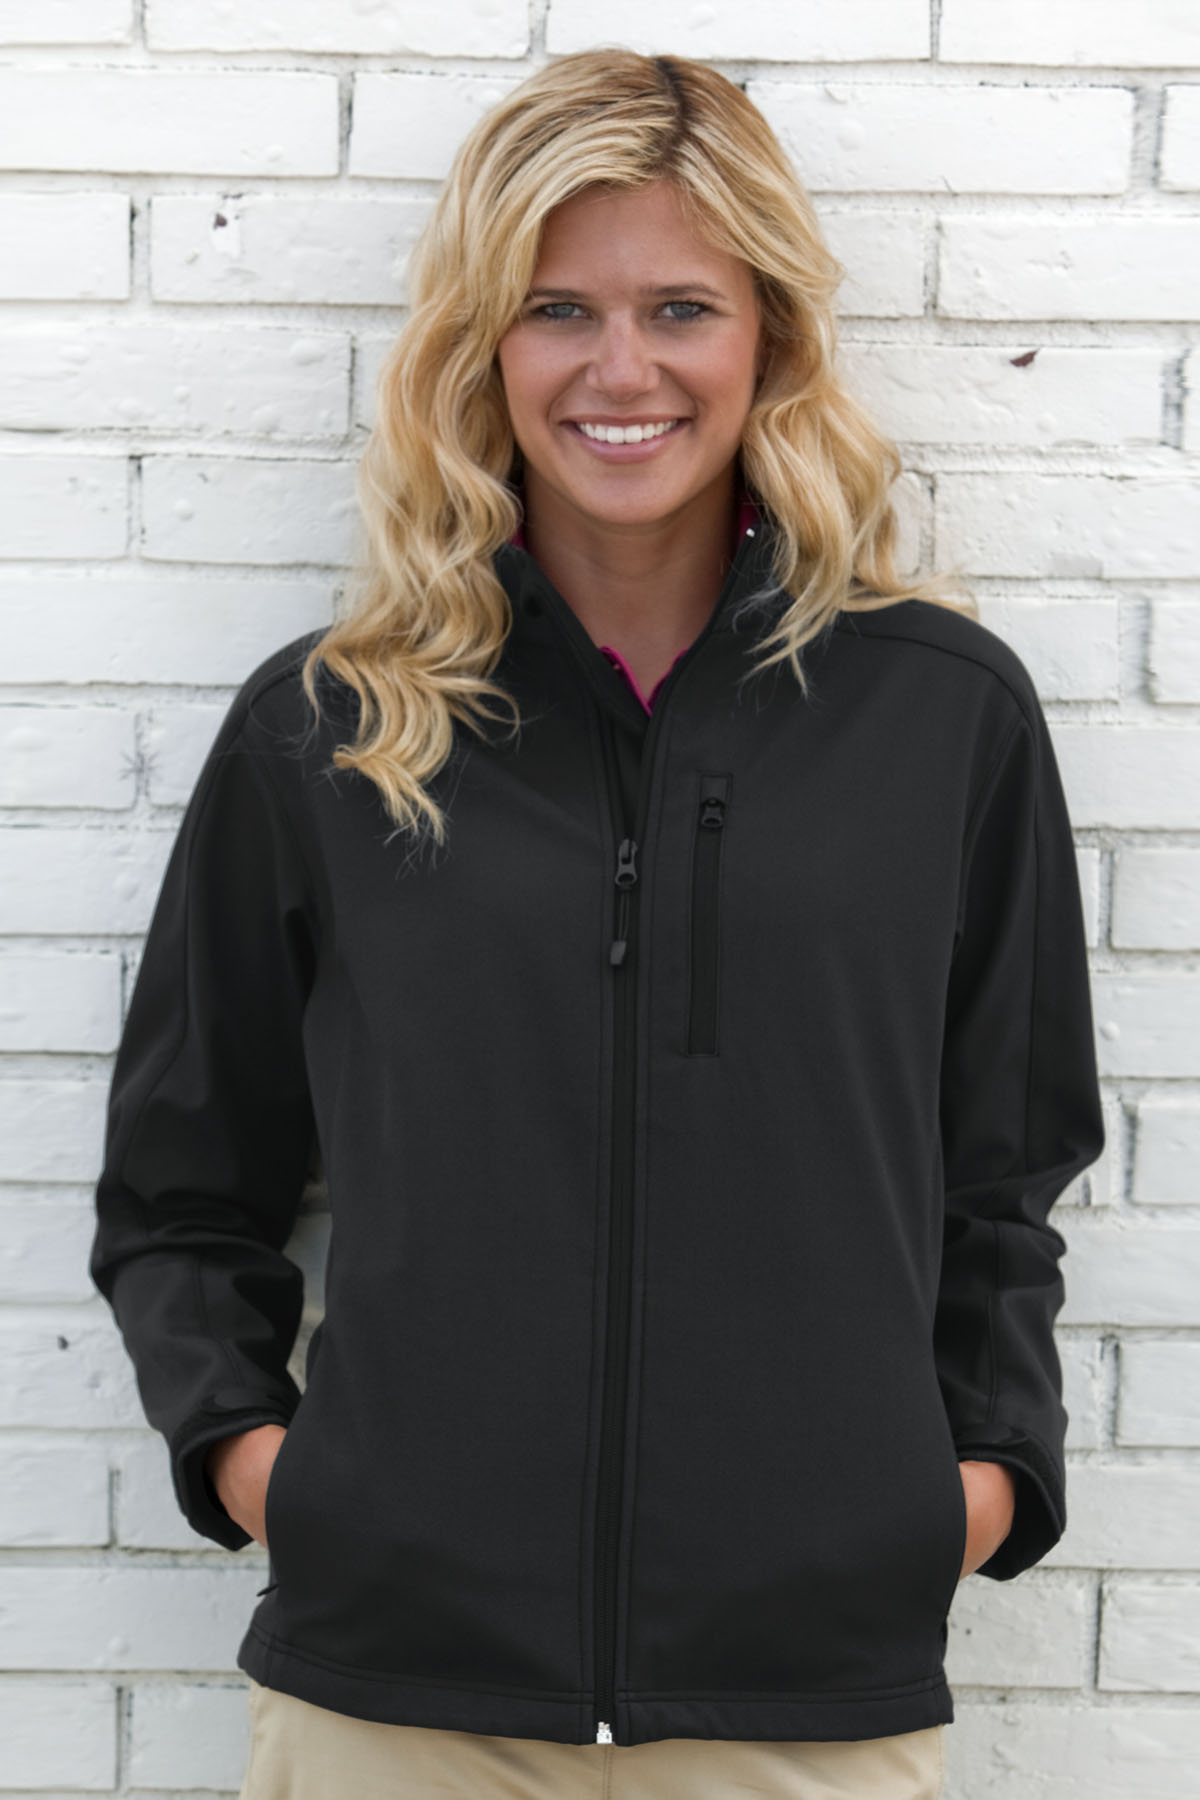 Vantage 7311 - Women's Quantum Bonded Jacket